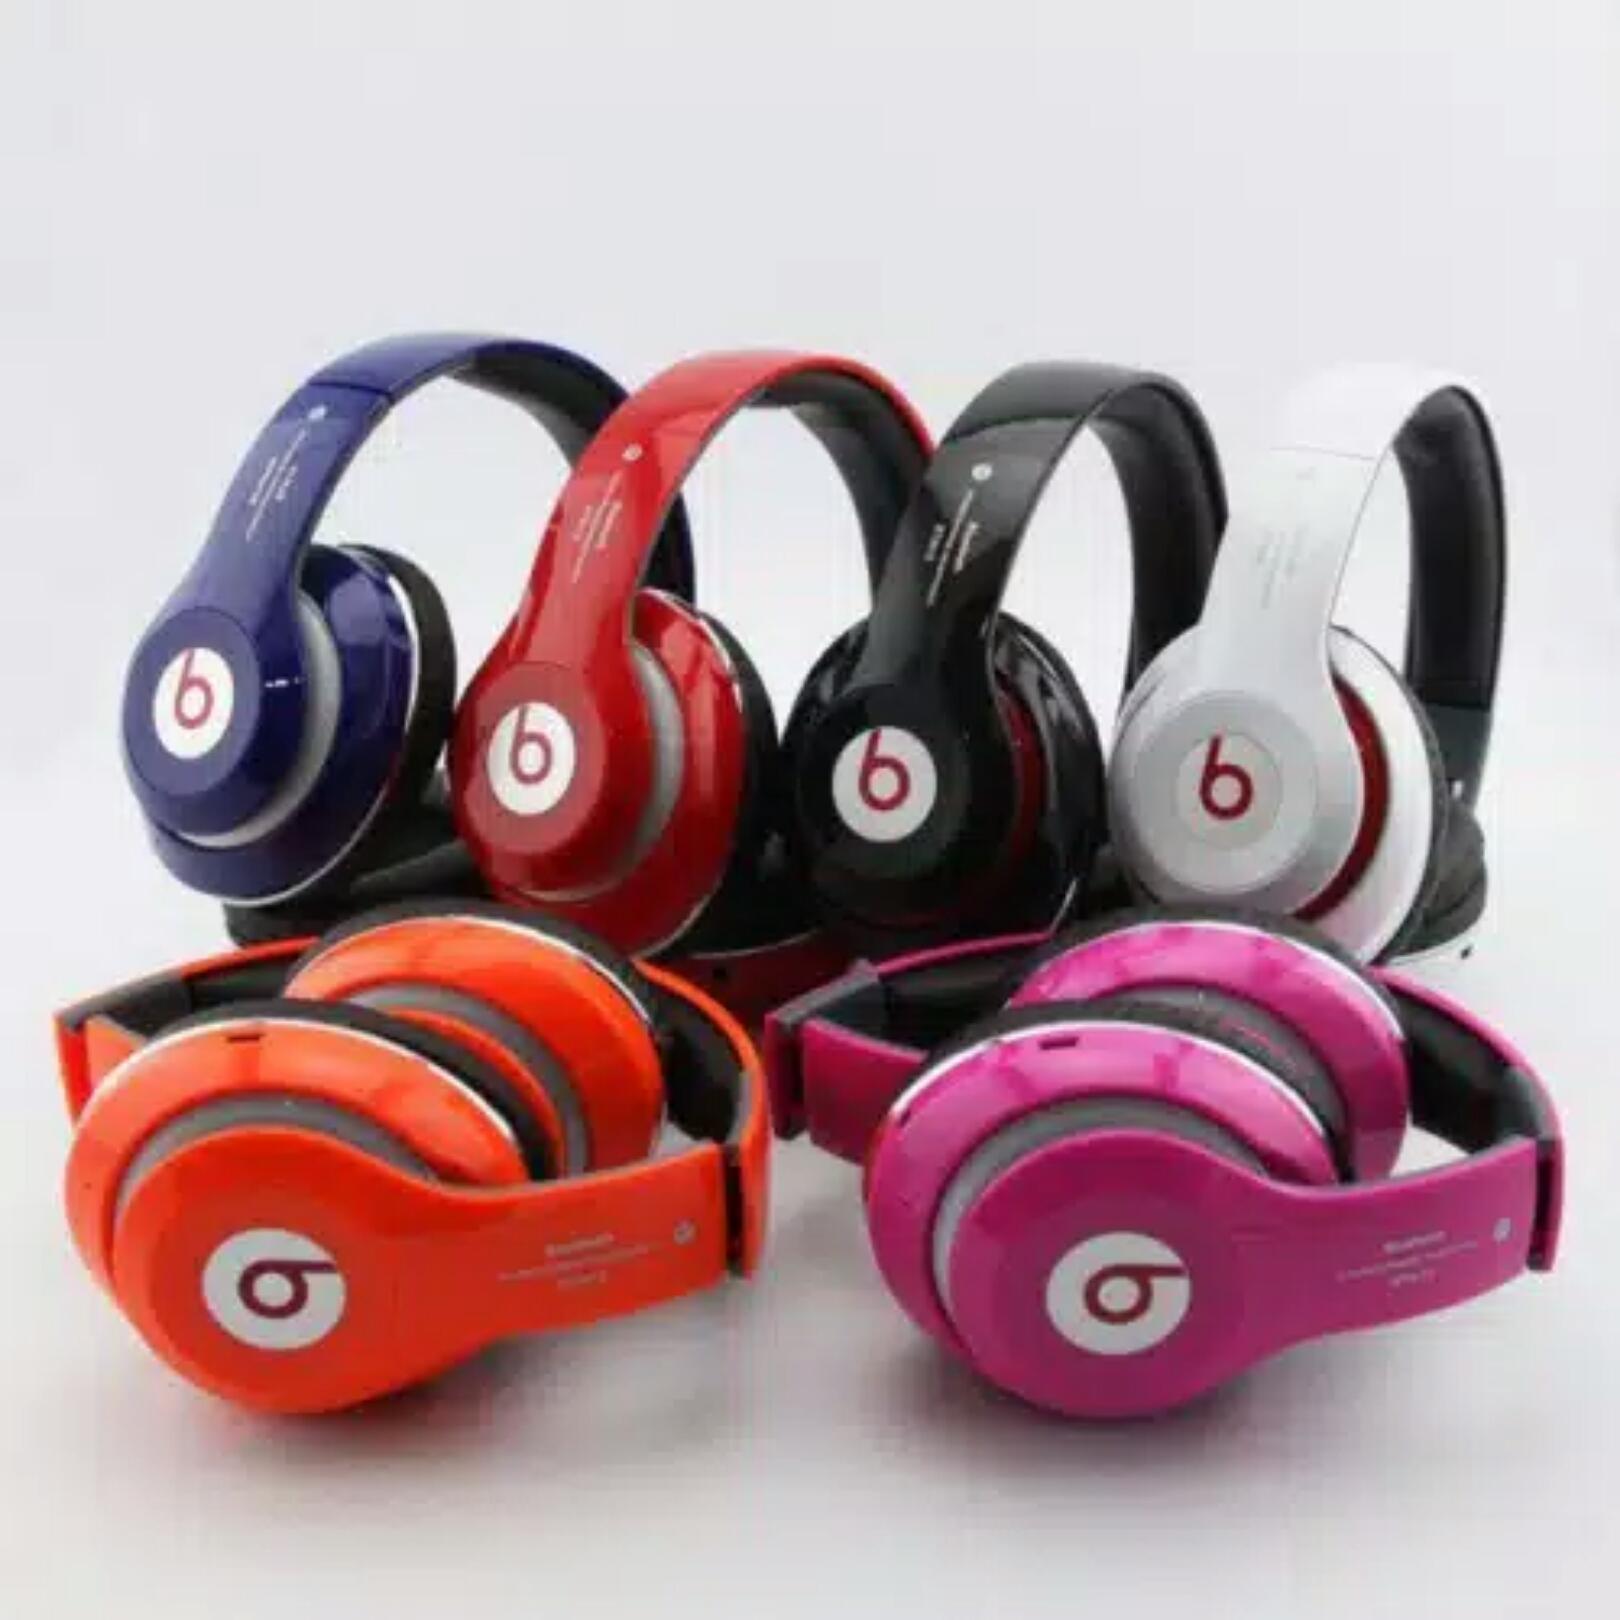 Jual Headphone Beats Bluetooth Zack Accesories